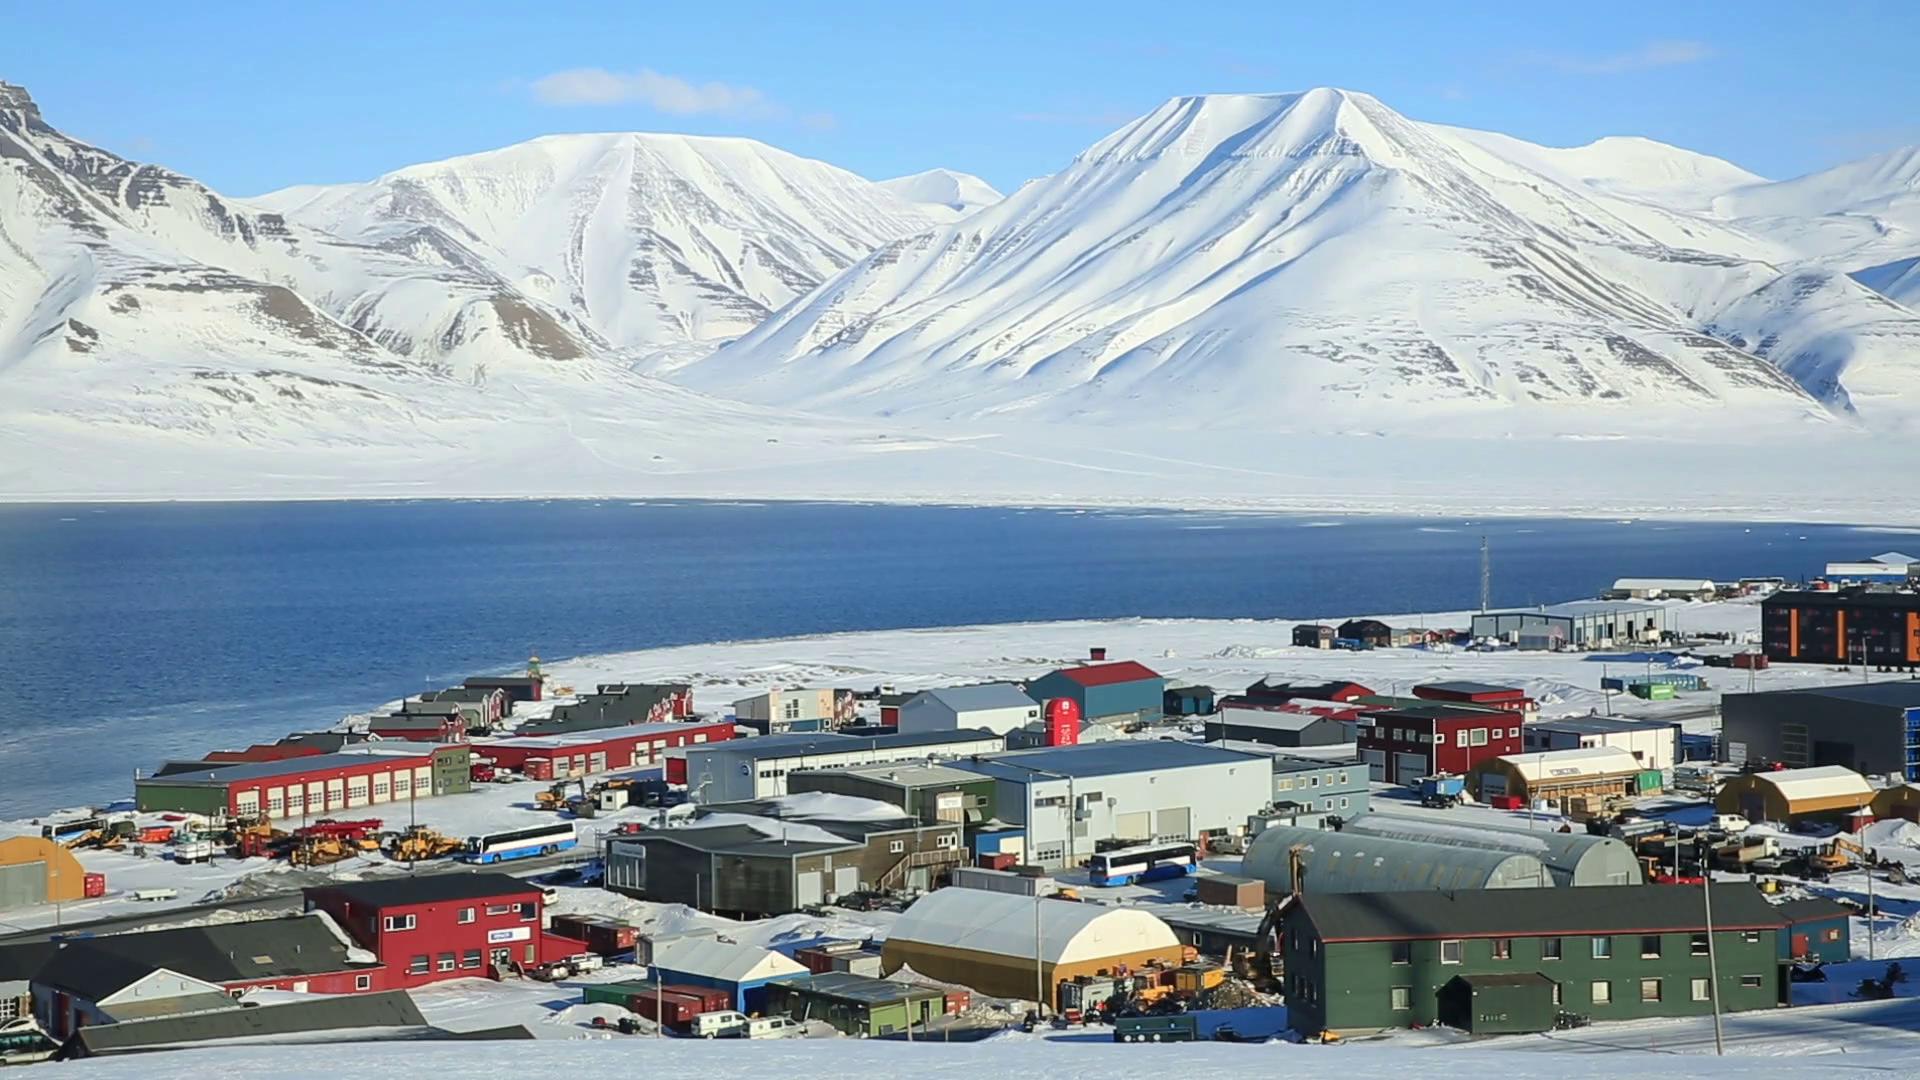 spitsbergen.png.fec9eb8d1f4f7bb42fdff4a804f5188a.png